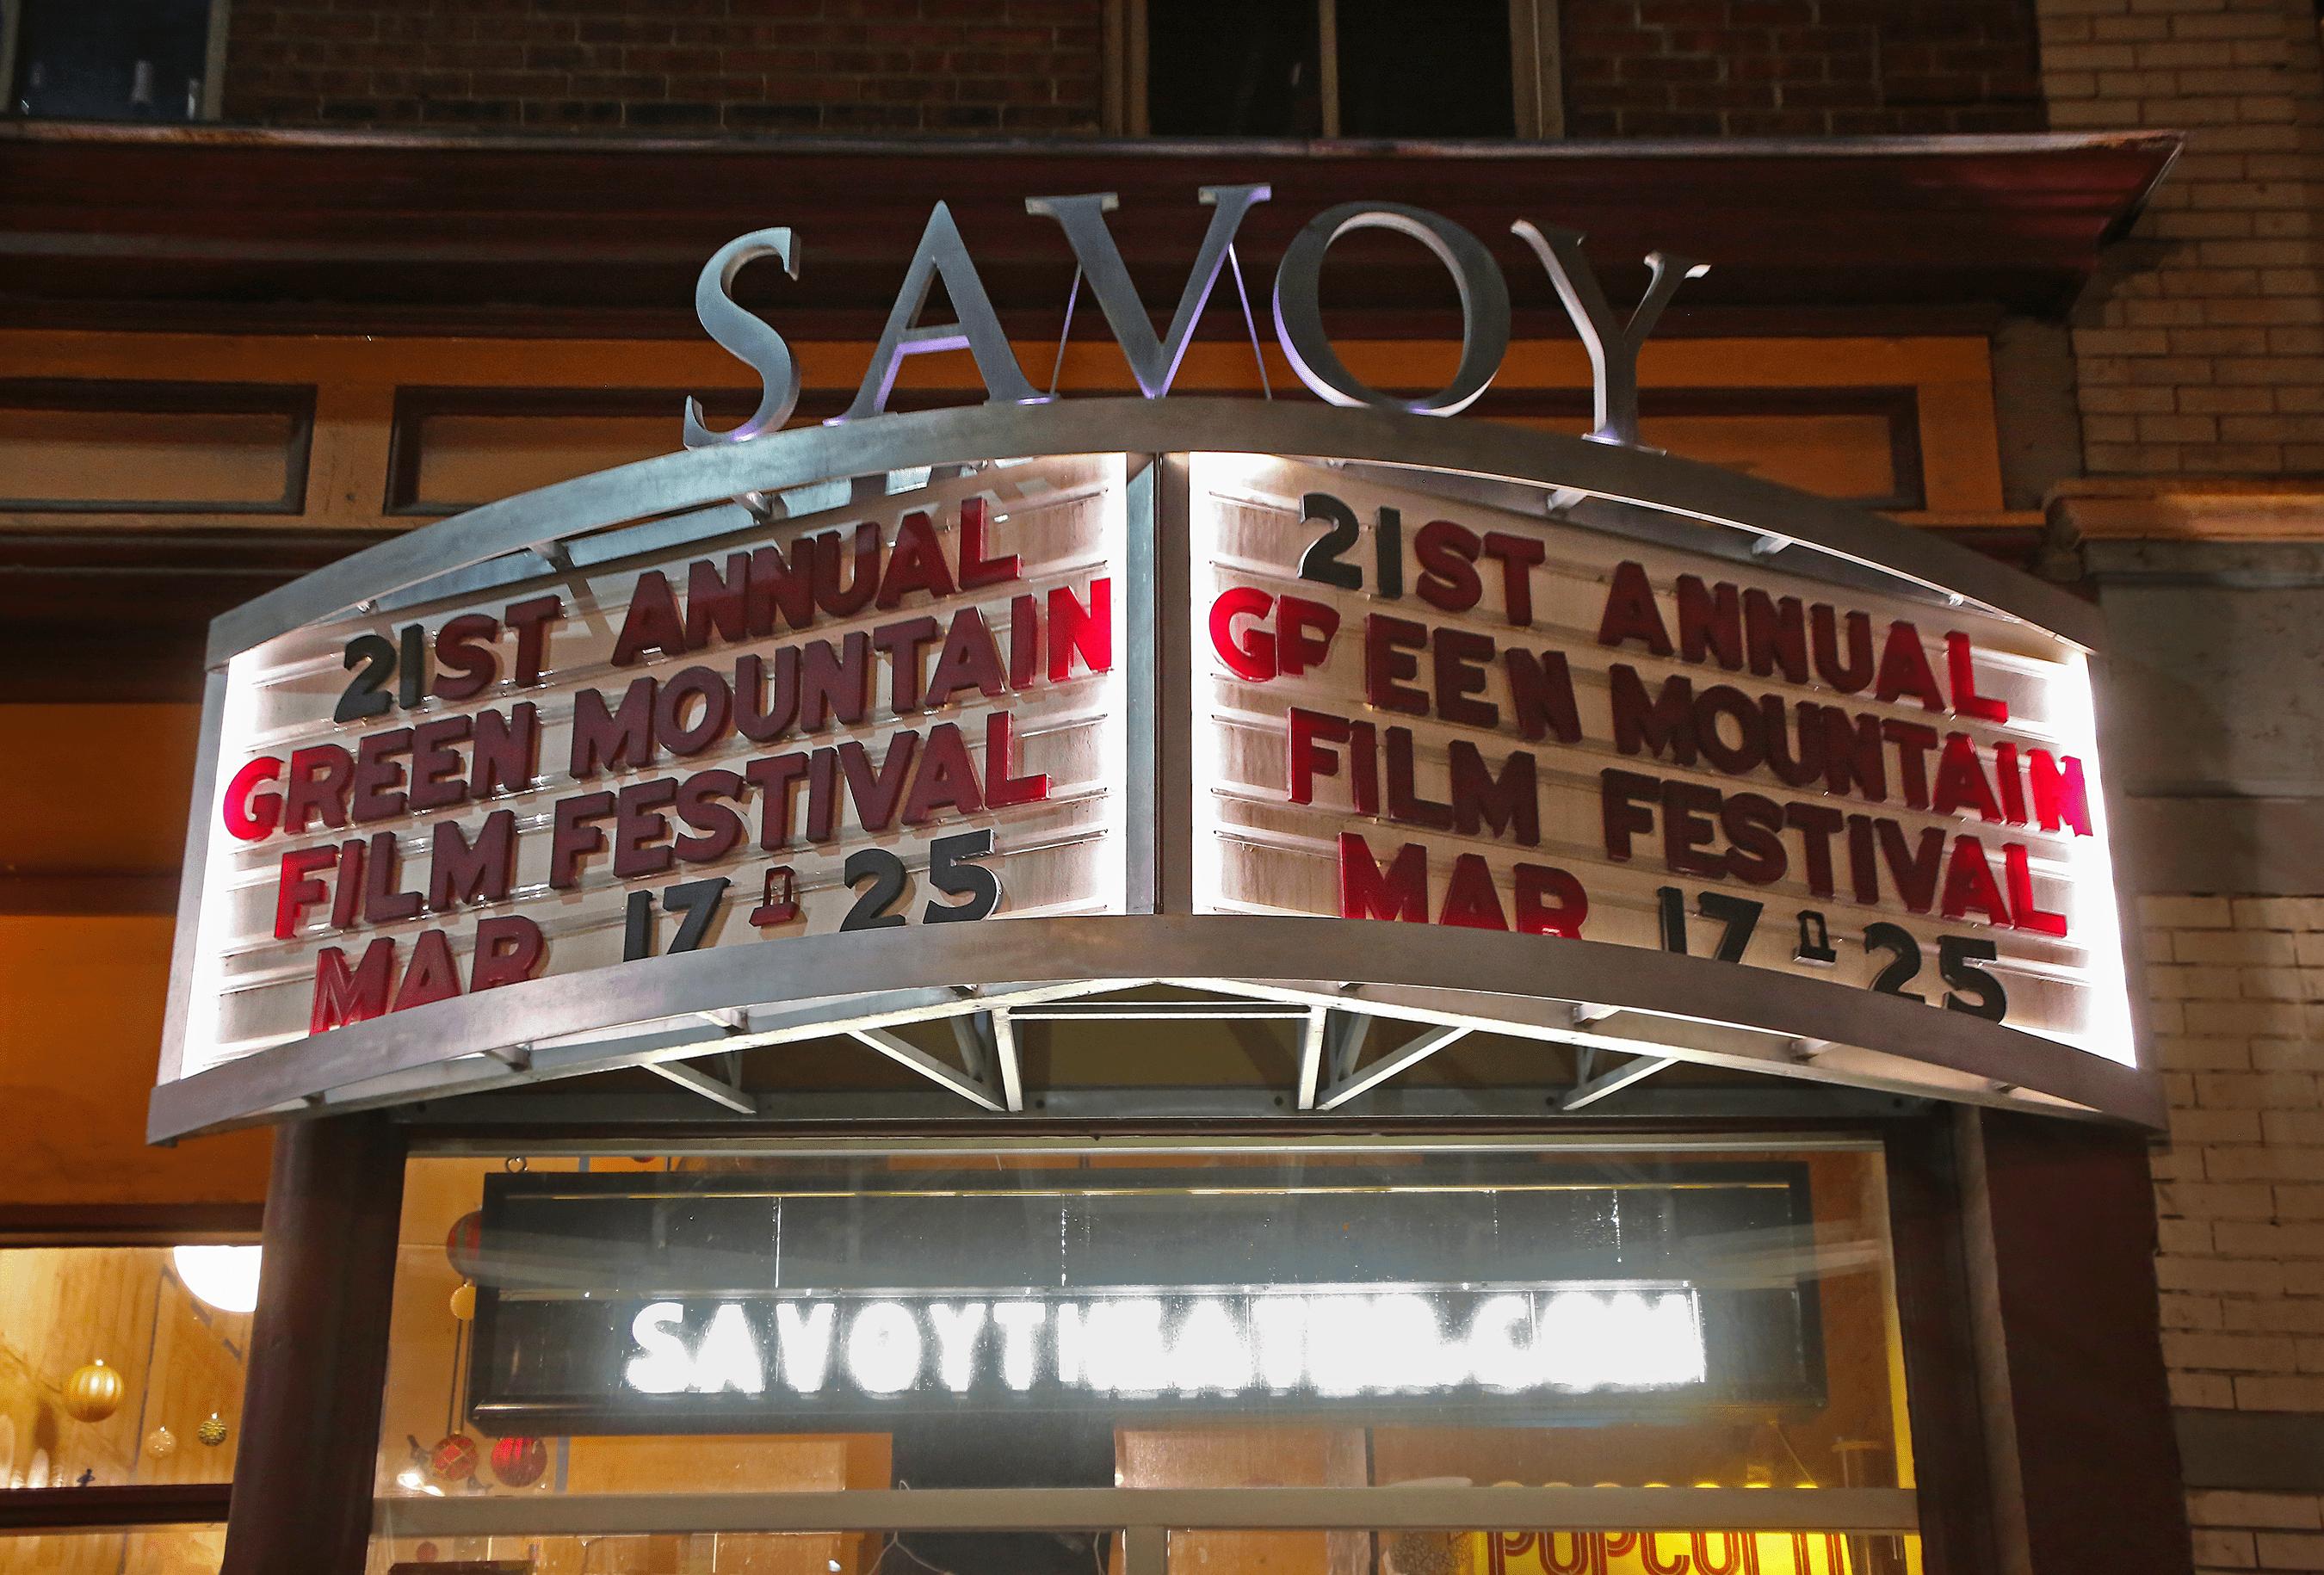 The Savoy Theatre marquee in Montpelier